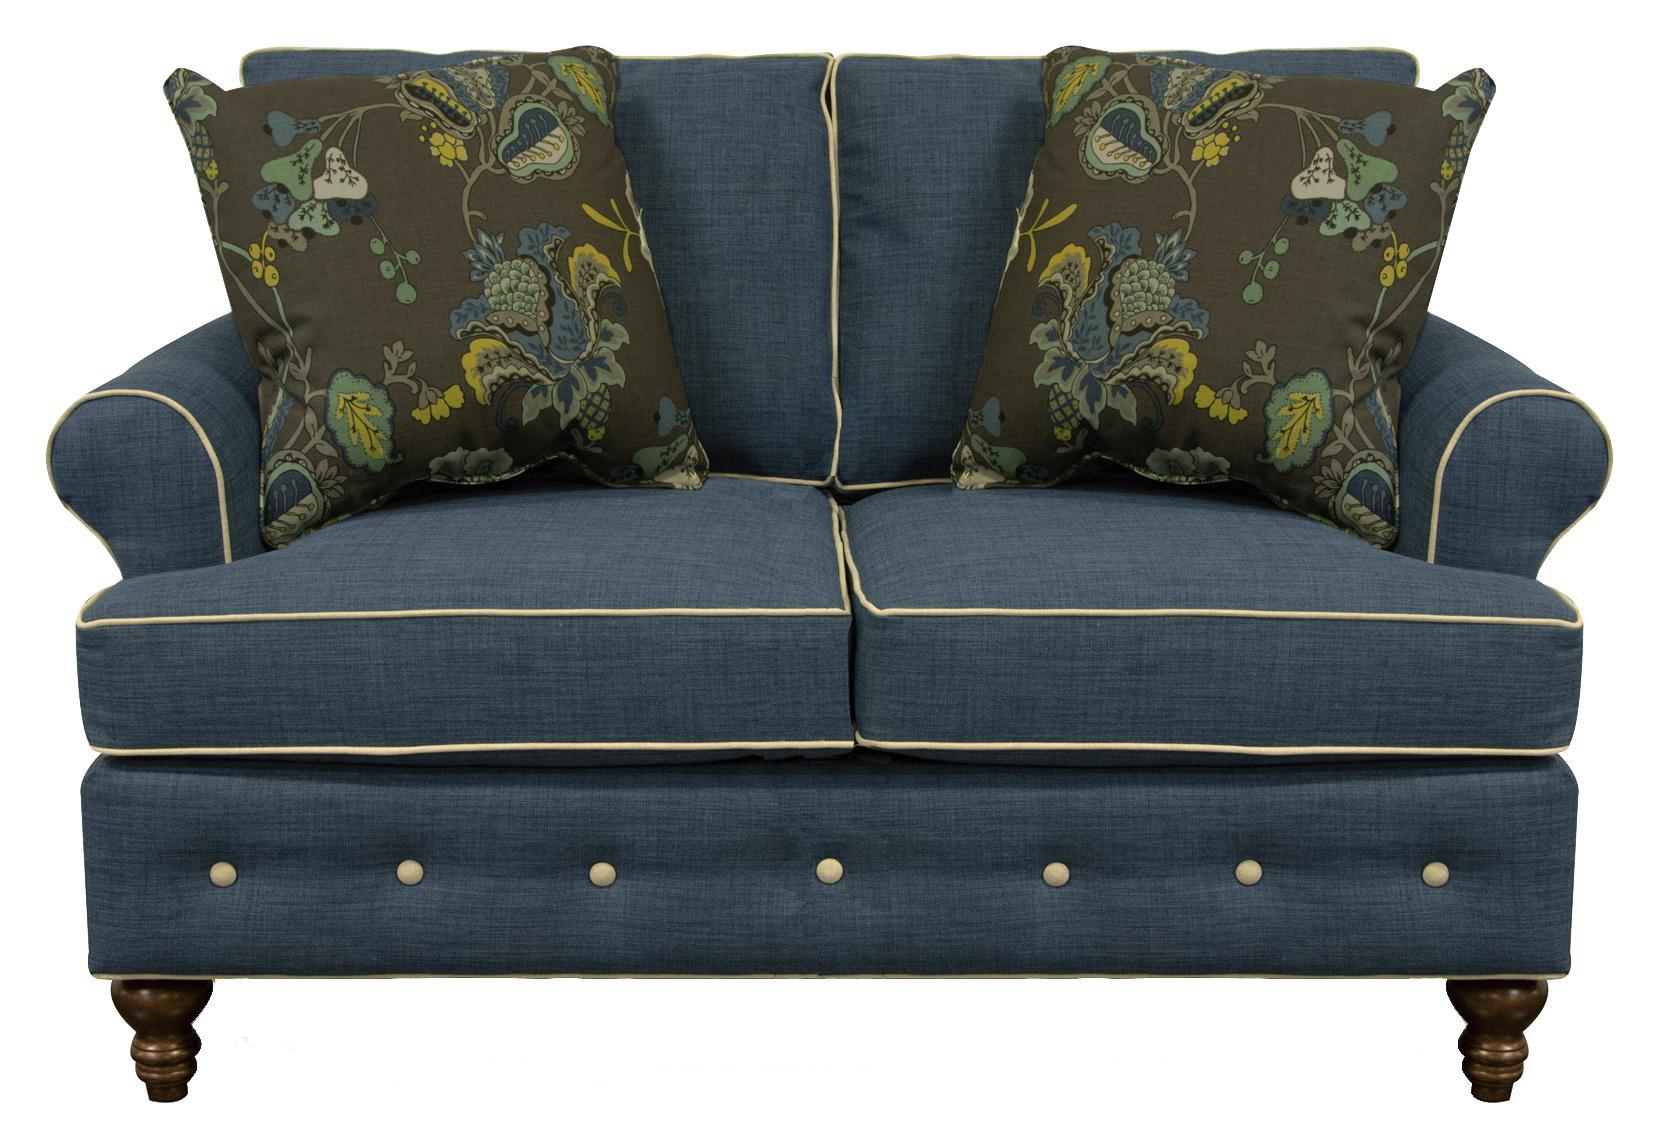 England Evans Living Room Loveseat - Item Number: 8486CW Roma Blue Dum Dum Natural